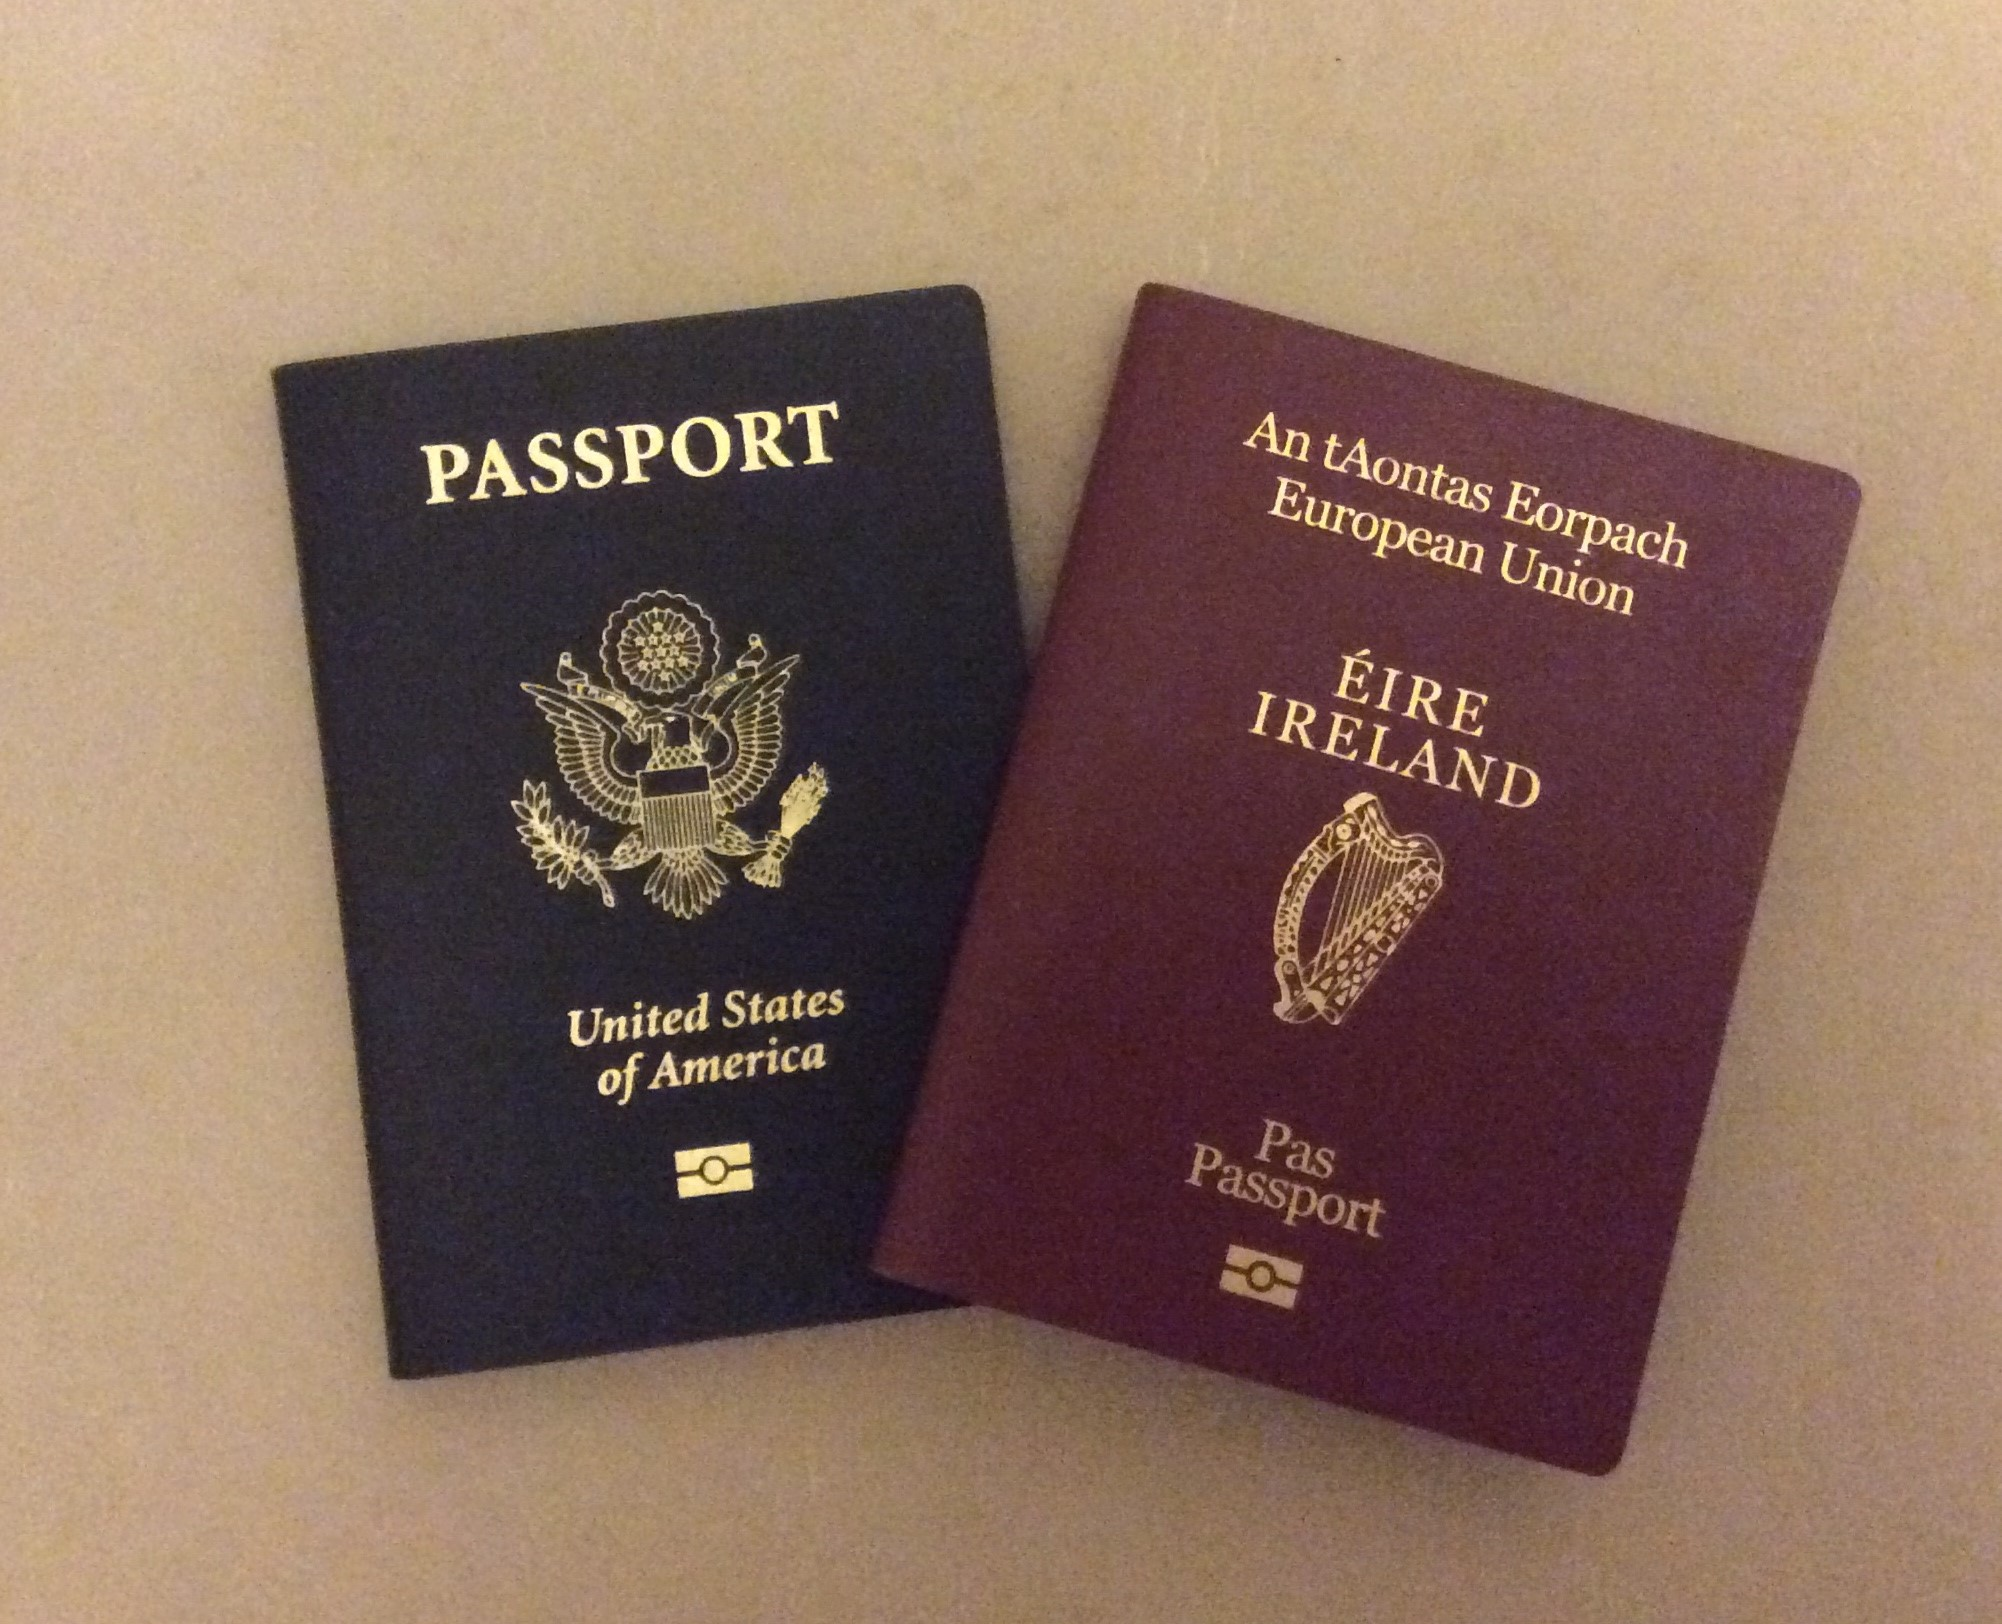 American Passport Renewal Form Ireland